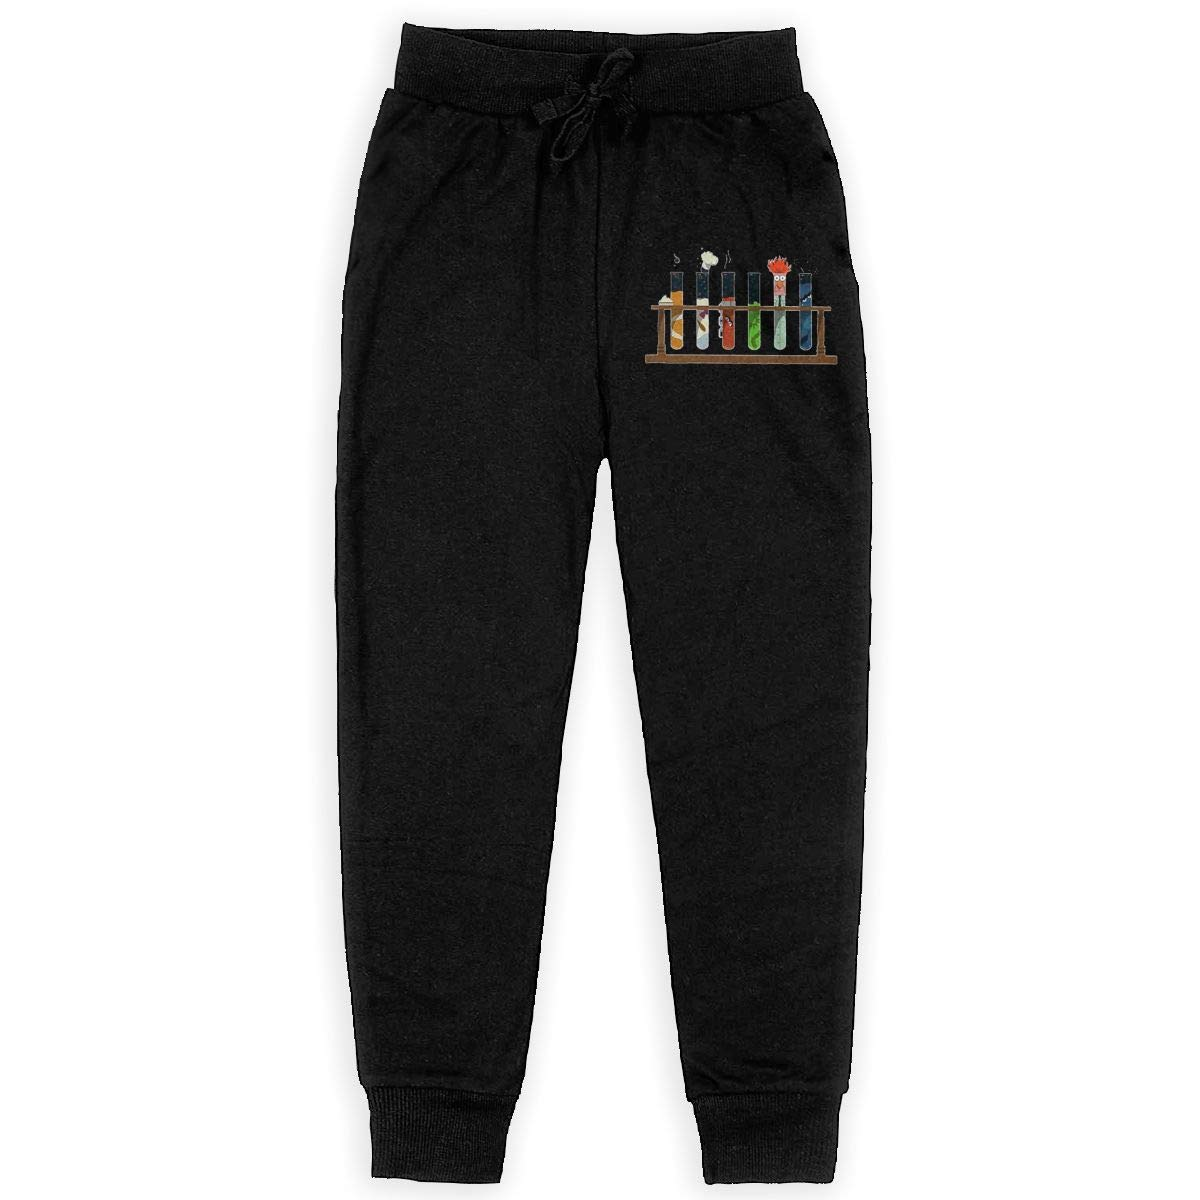 Qinf Boys Sweatpants Science Chemistry Joggers Sport Training Pants Trousers Black